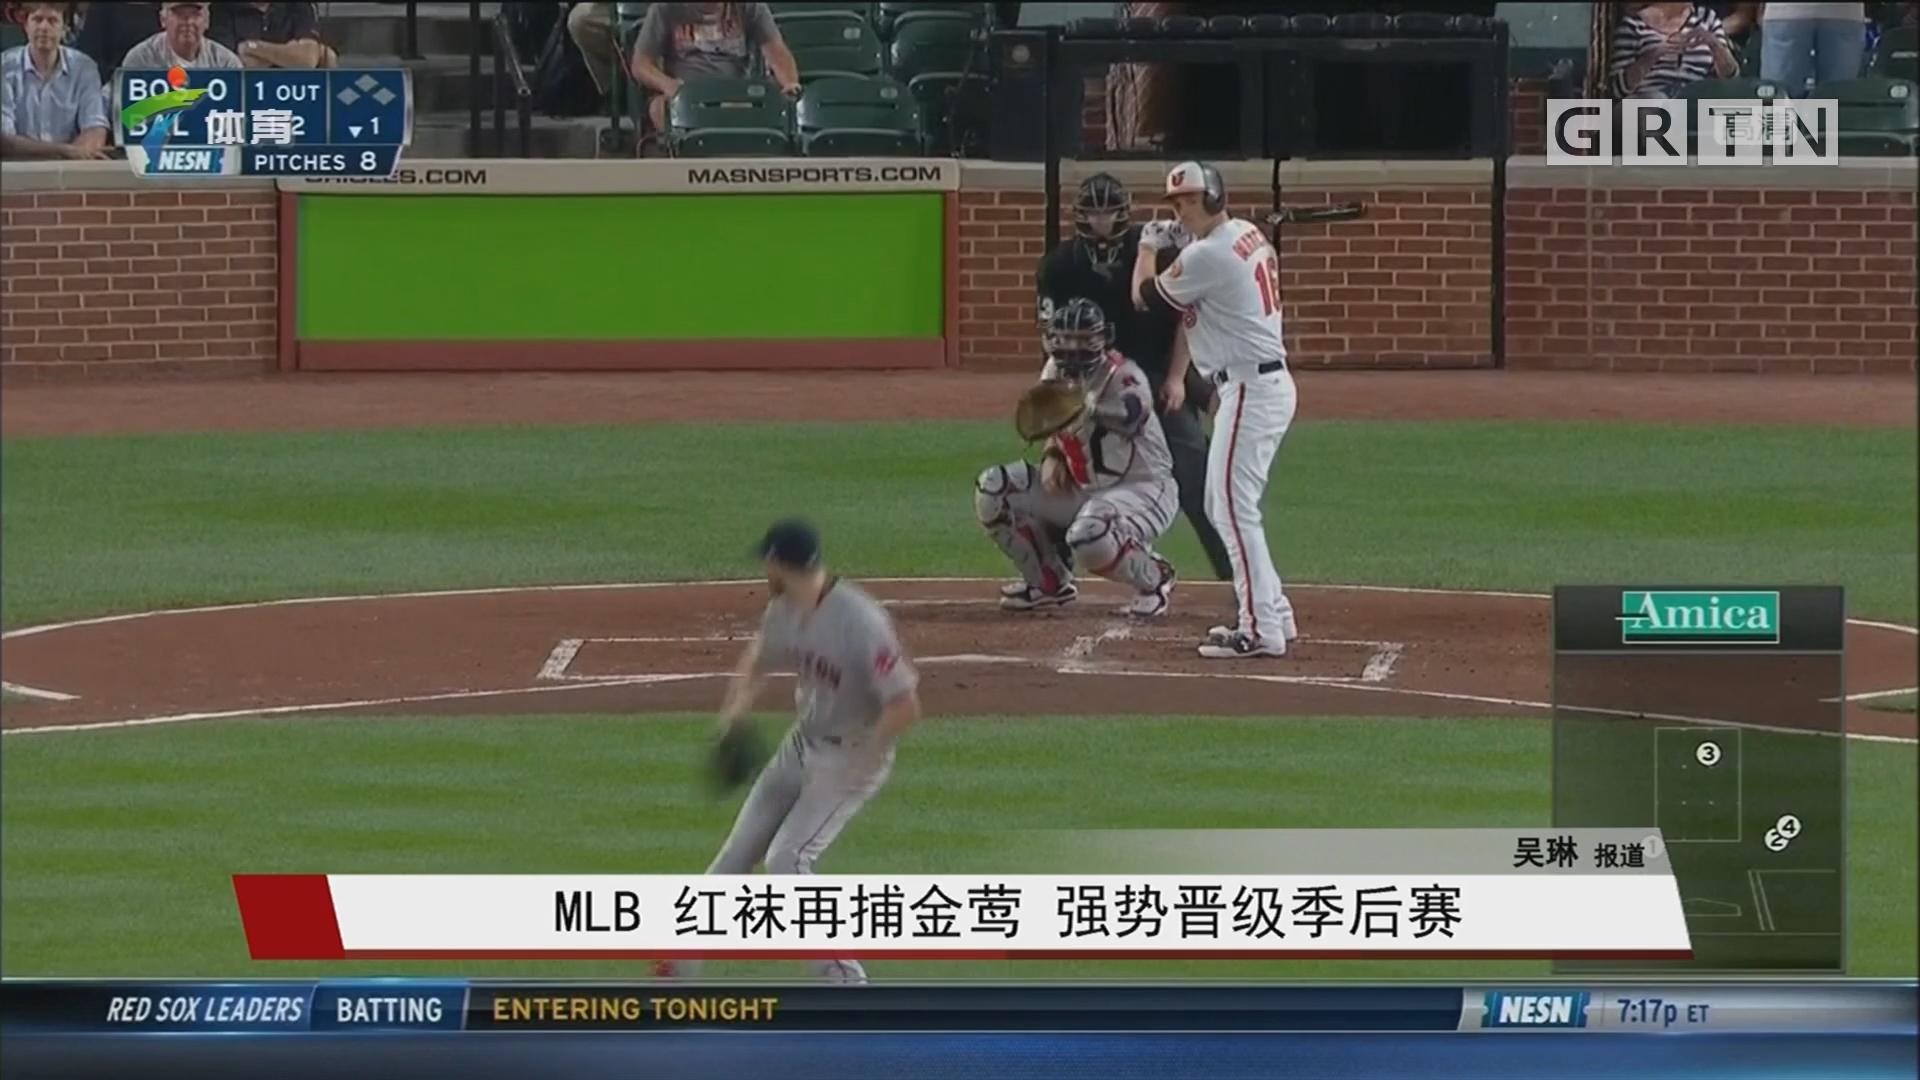 MLB红袜再捕金莺 强势晋级季后赛